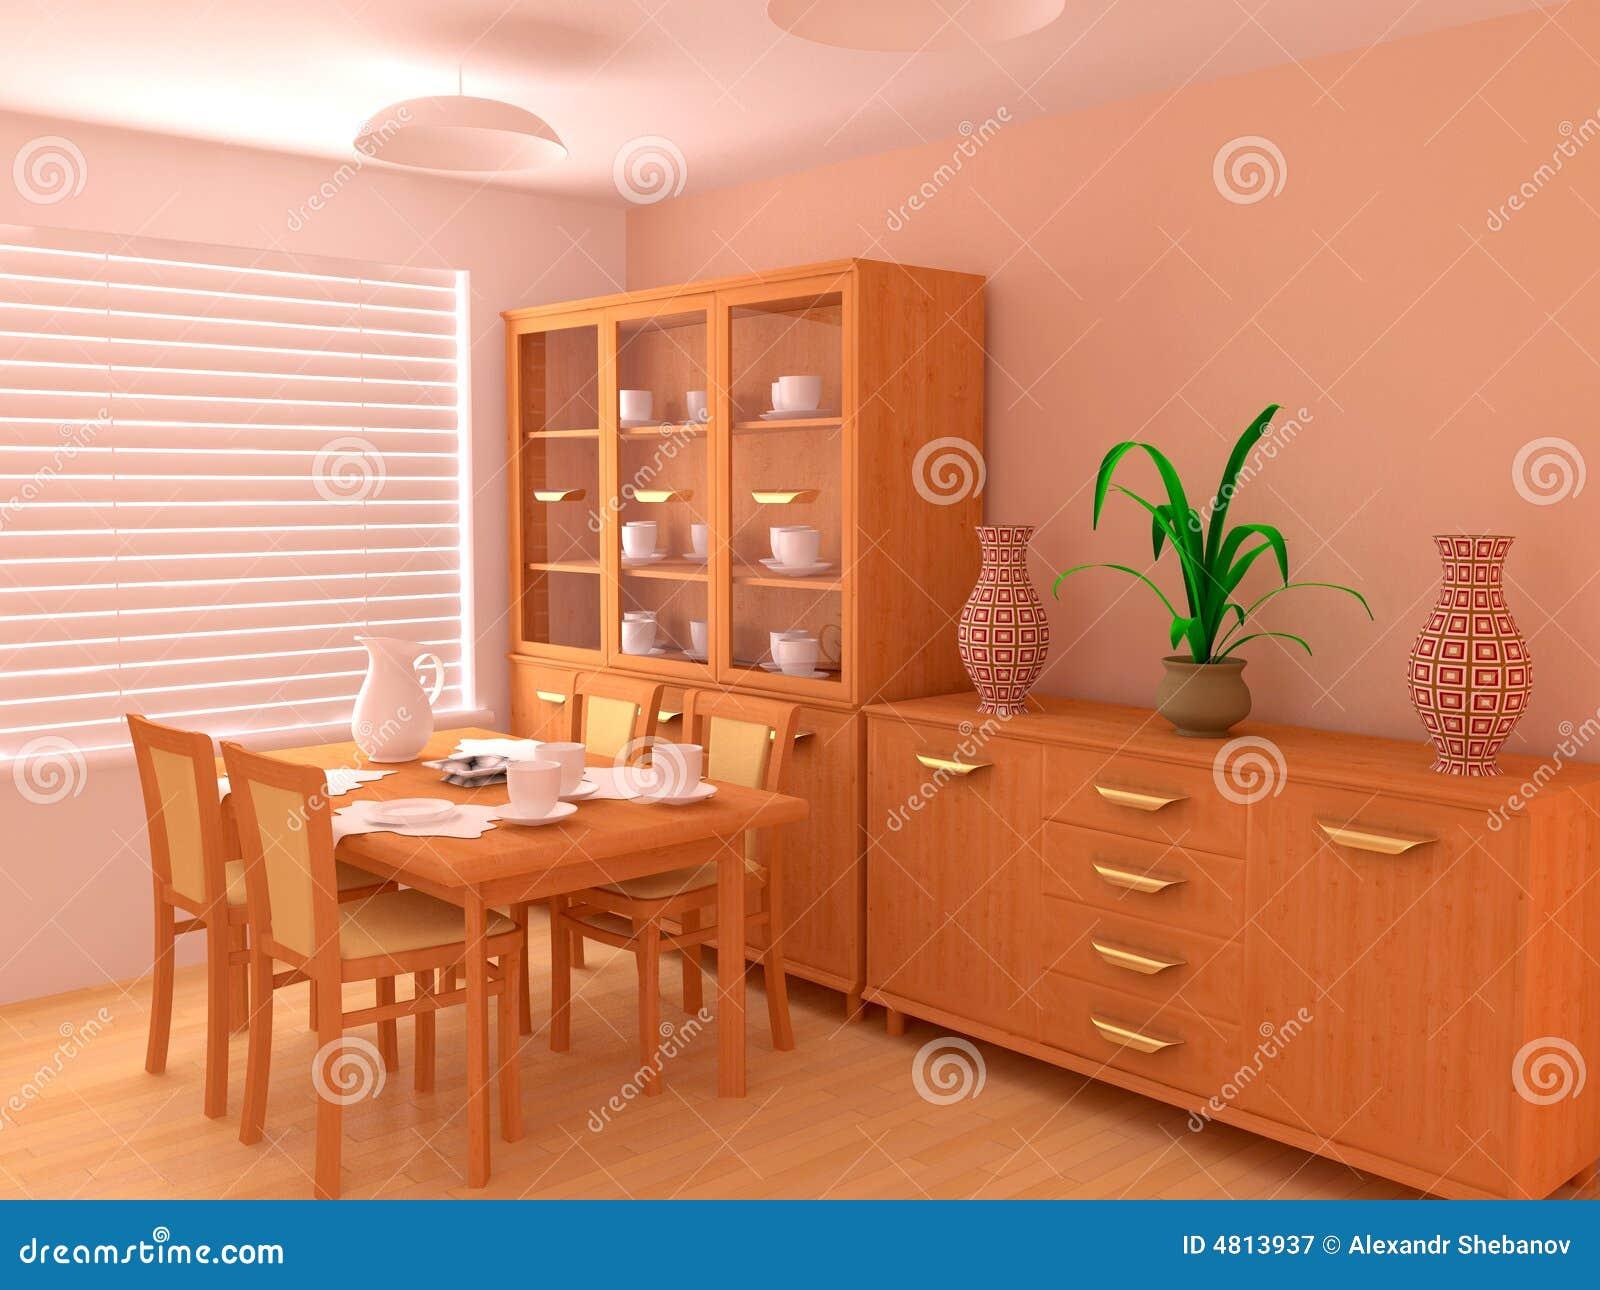 small teen bedroom ideas furniture home decor interior design